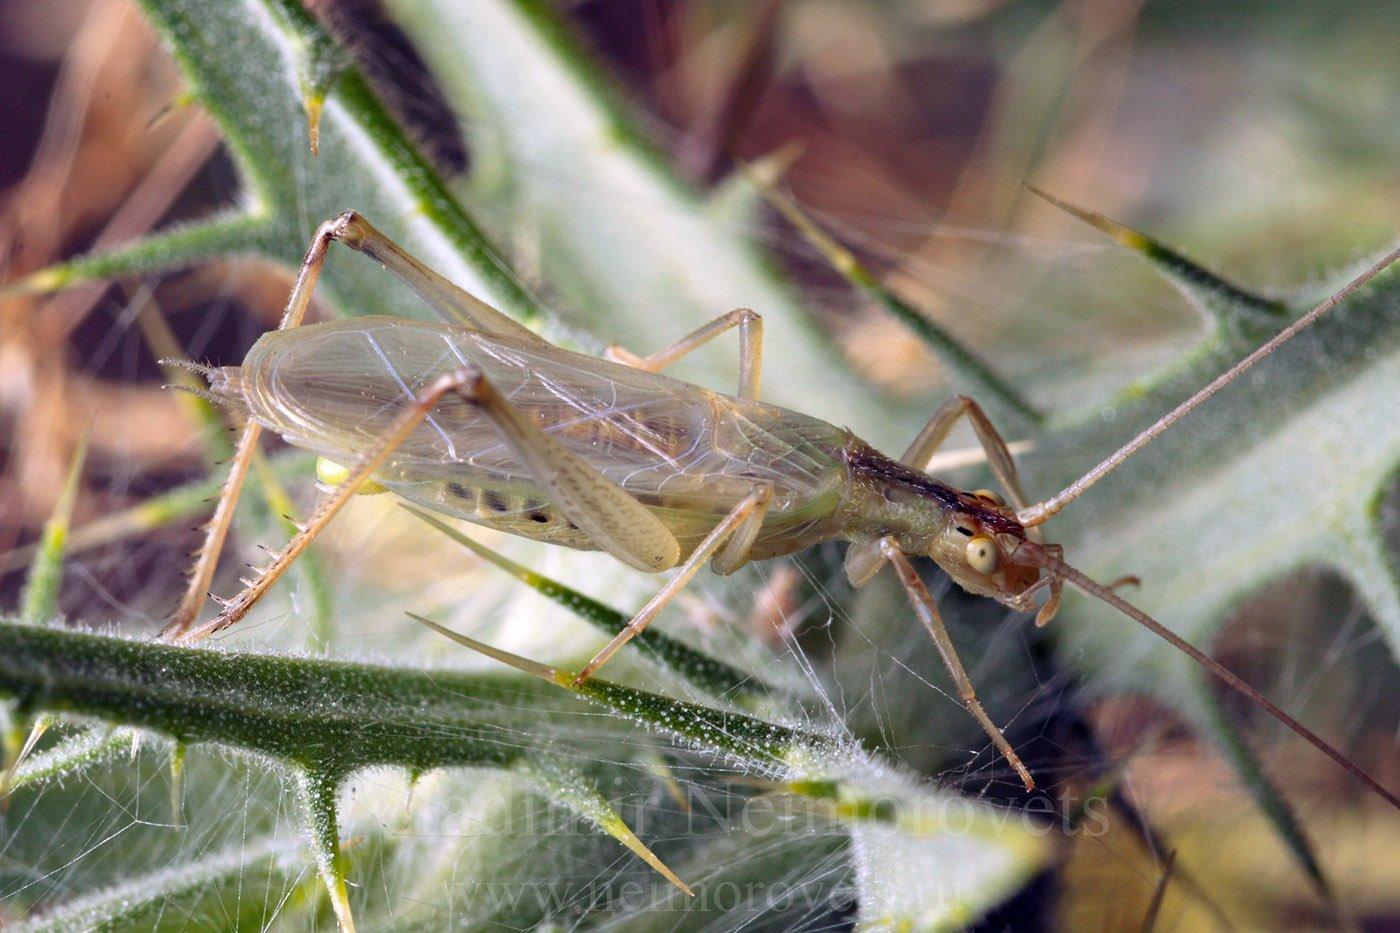 italian tree cricket, oecanthus pellucens, northwestern caucasus, krasnodar territory, summer, imago, adult, tree cricket, Владимир Нейморовец